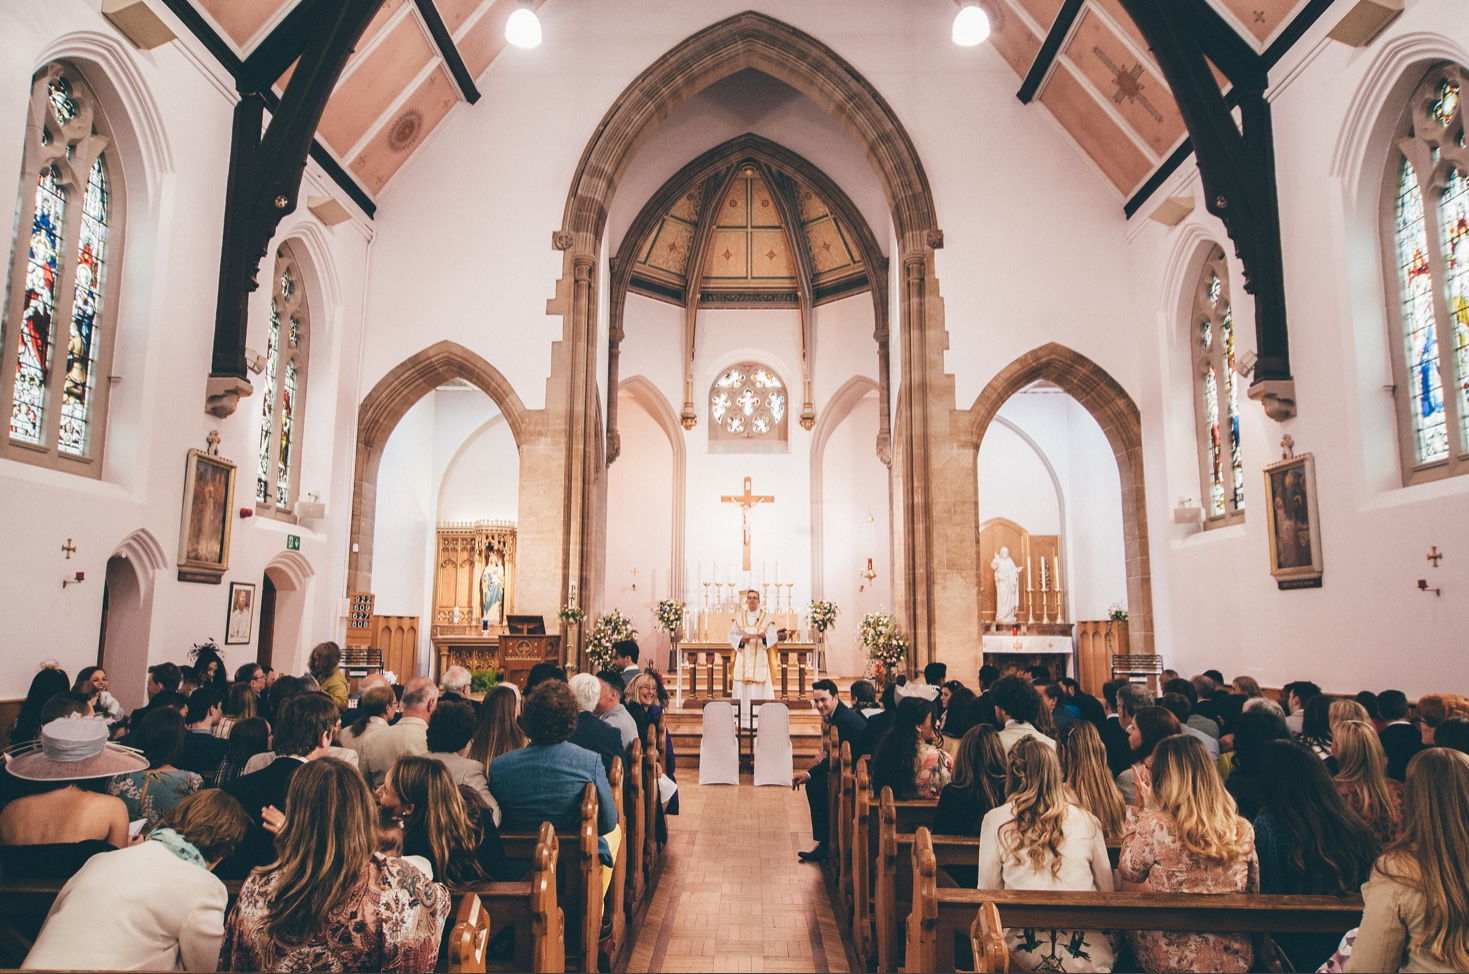 Weddings St Charles St Thomas More Catholic Parish In Liverpool